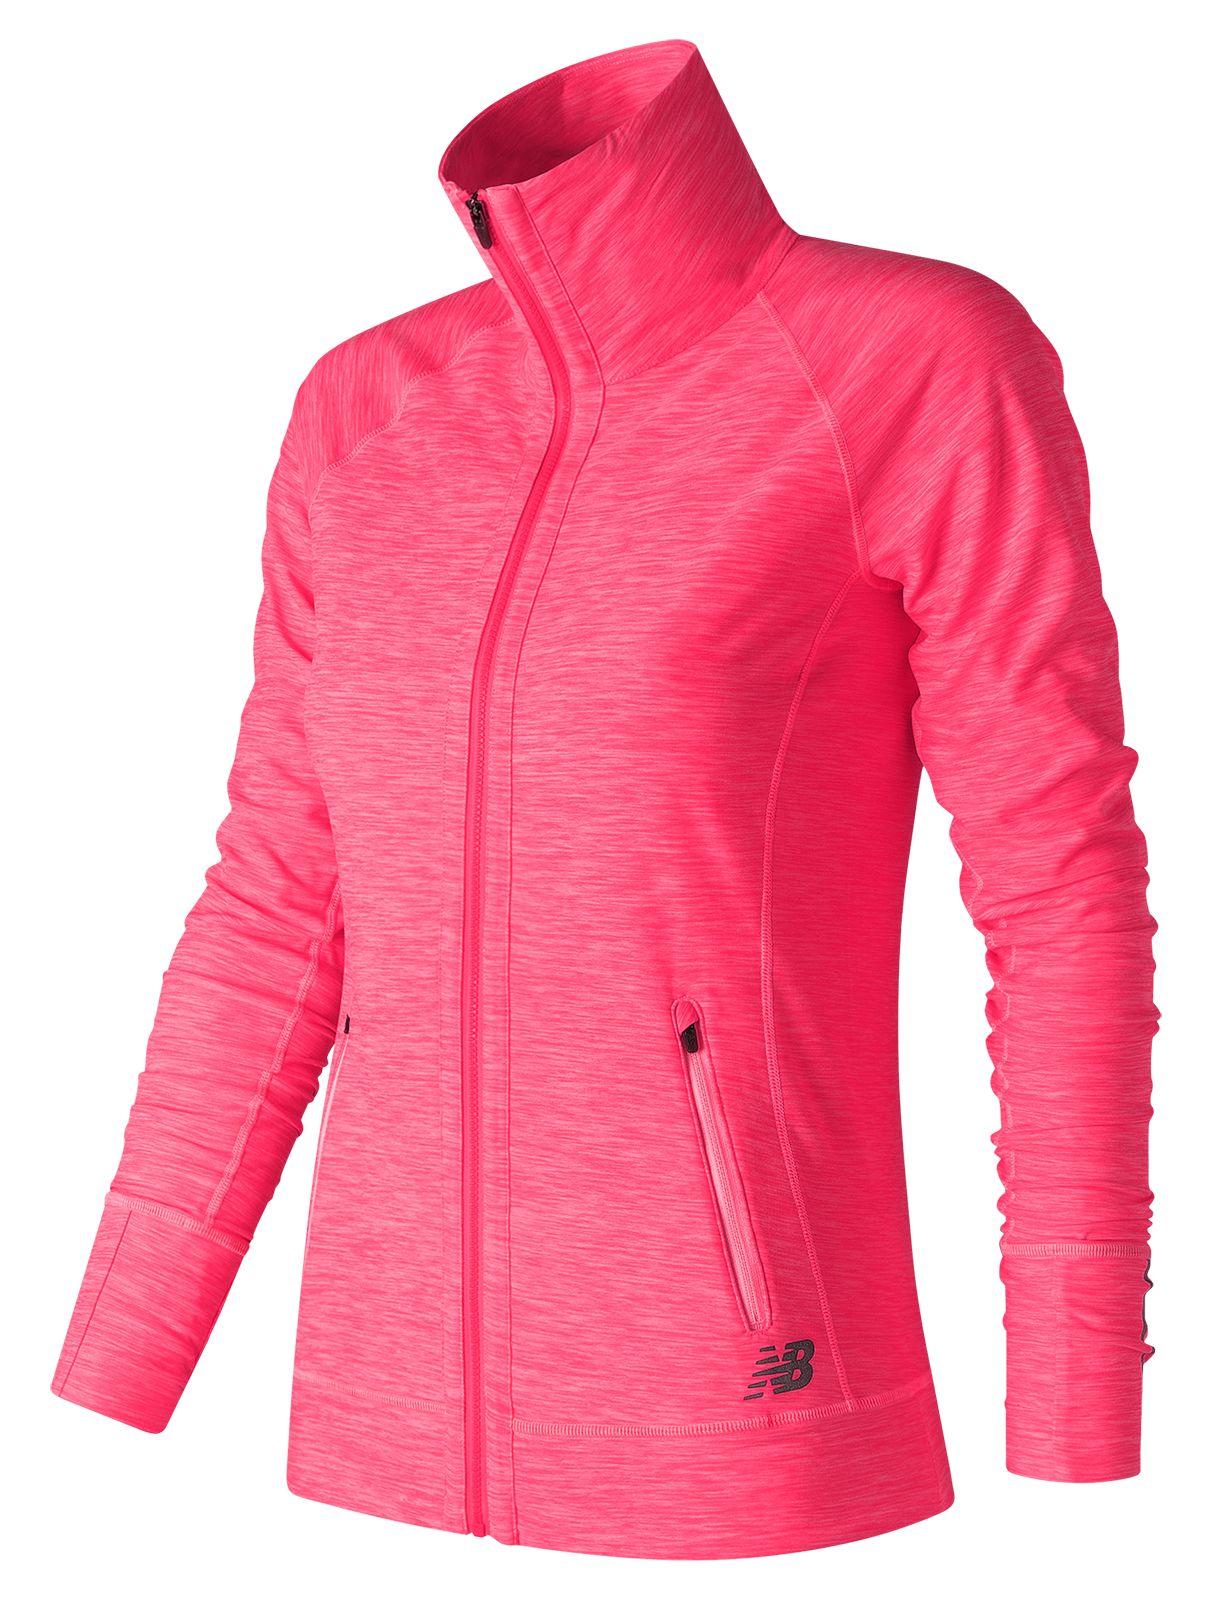 NB In Transit Jacket, Alpha Pink Heather